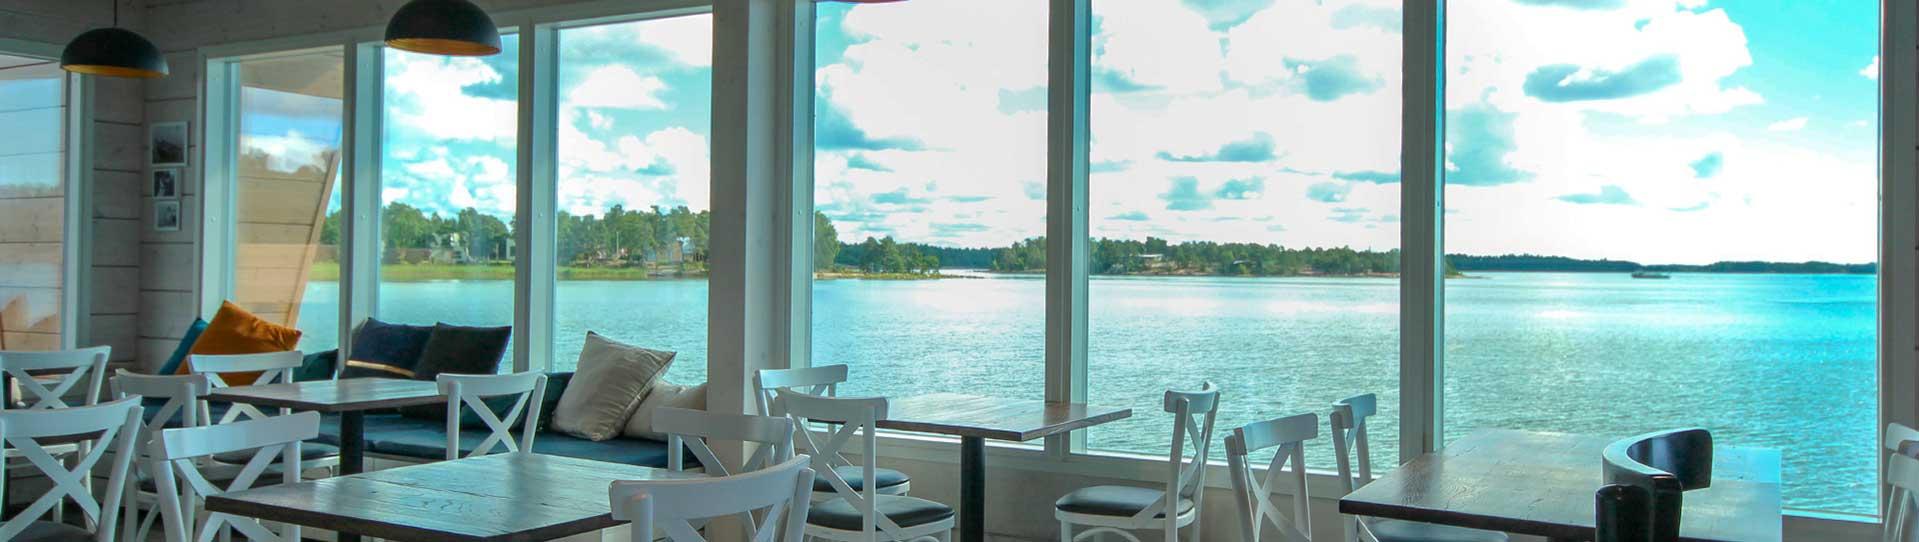 Seaside cafe Nokkalan Majakka is one of the meeting venues of Kassiopeia Hotels & Restaurants.